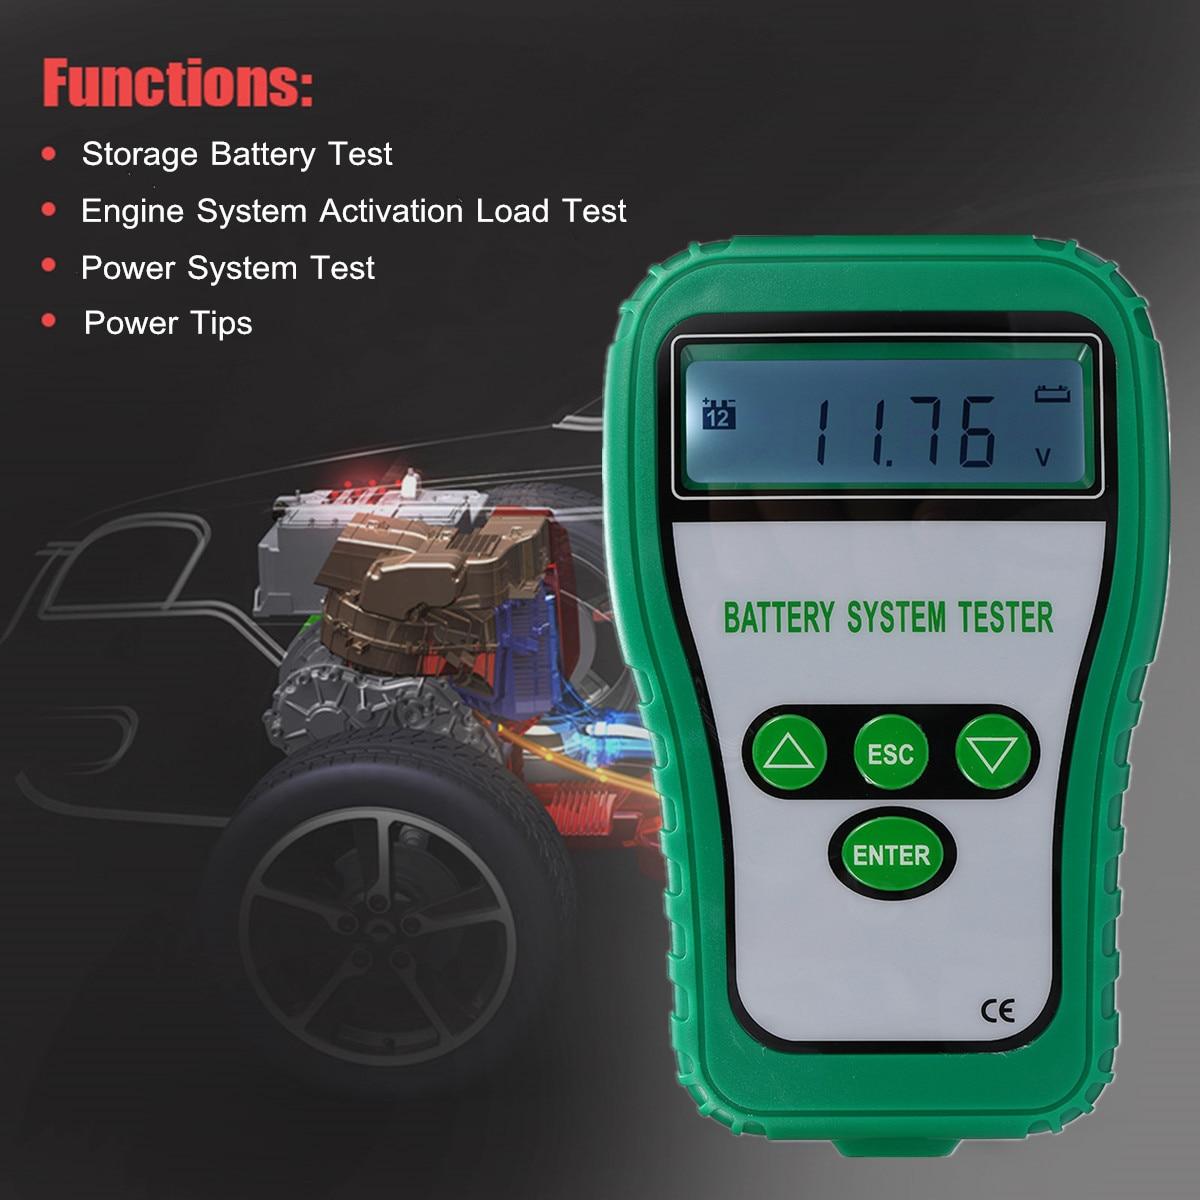 12V LCD Digital Battery Tester Analyzer Tester Cranking Amps Battery Alternator Battery System Resistance Voltage Life Analysis alternator 2871a308 12738 for perkins 1004 40t 1104d 44 1104c 44 1006 6t 12v 85a